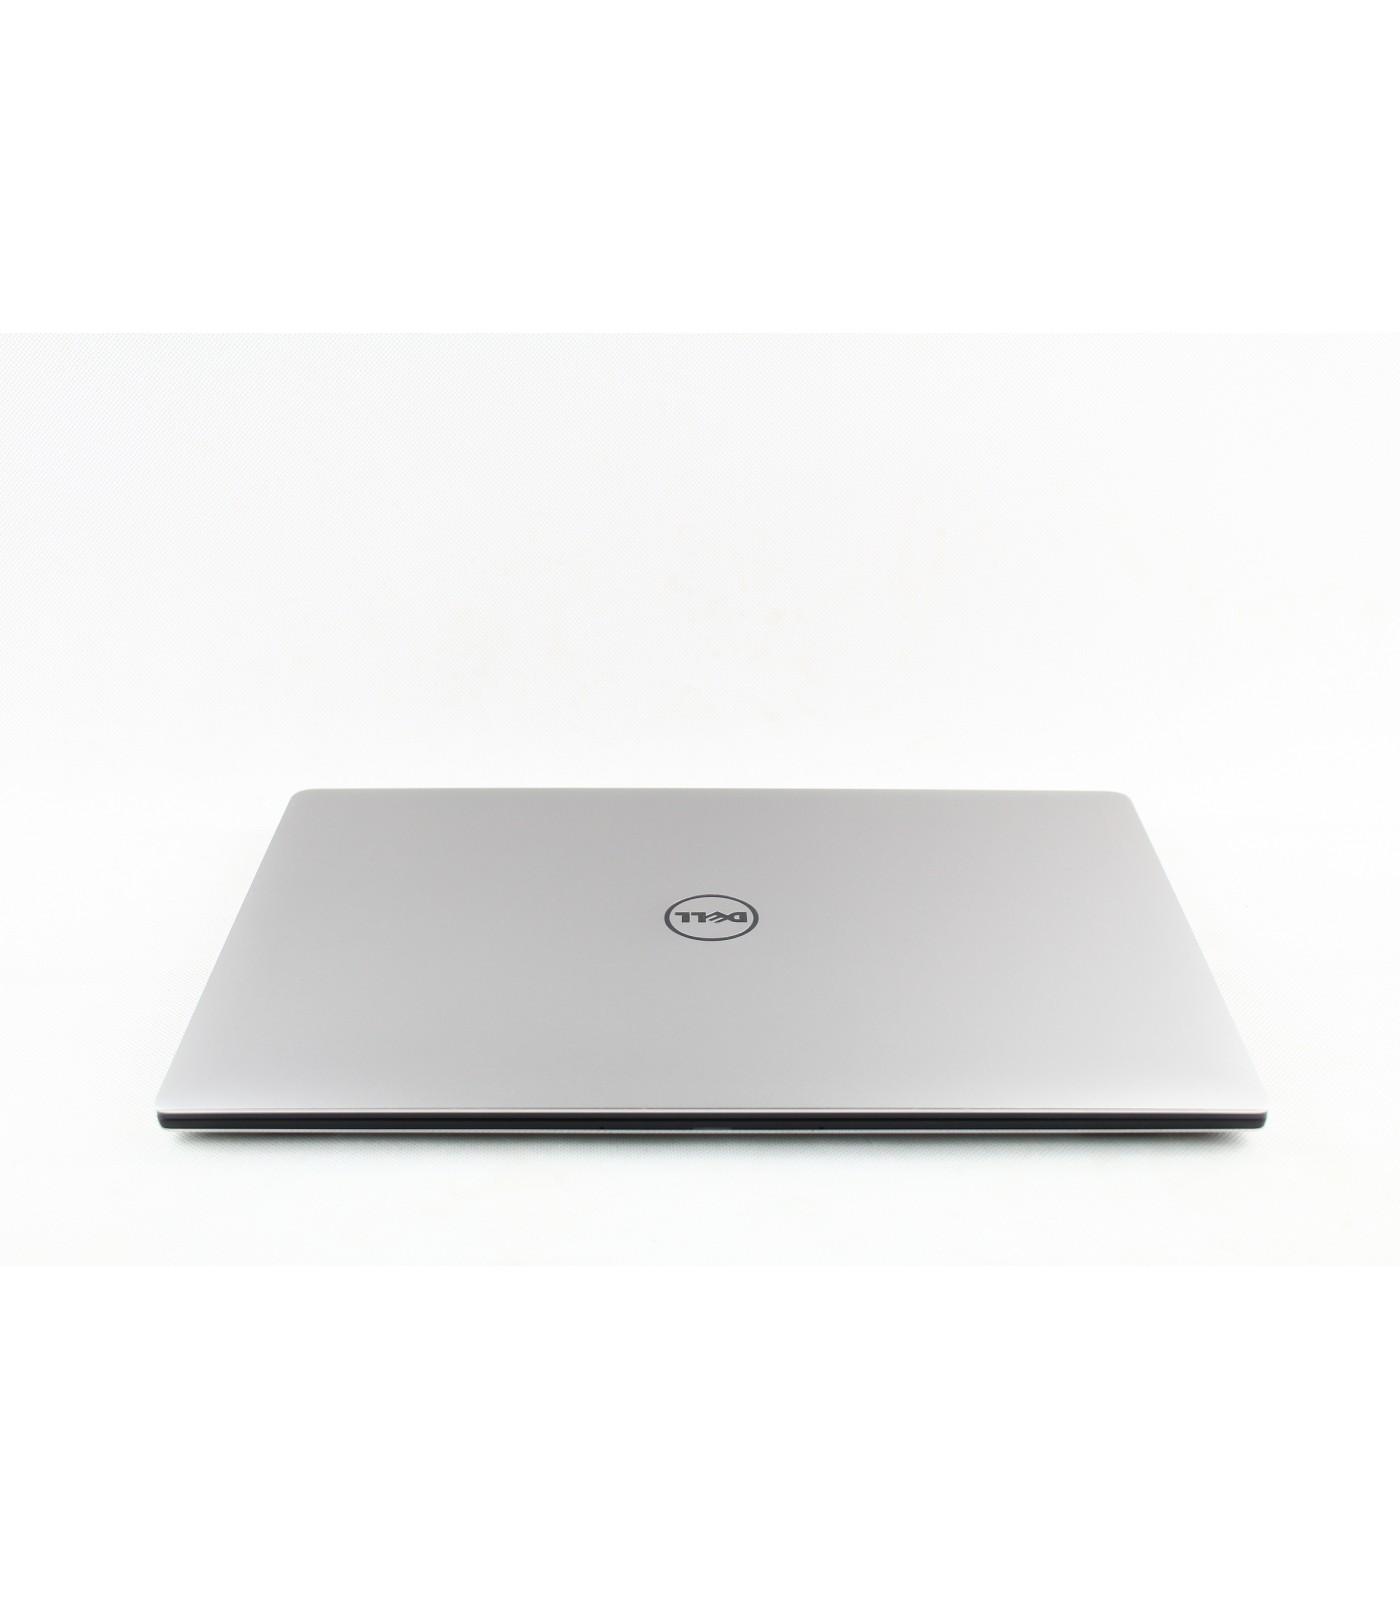 Poleasingowy laptop Dell Precision 5510 z Intel Core i7-7820HQ w Klasie A.